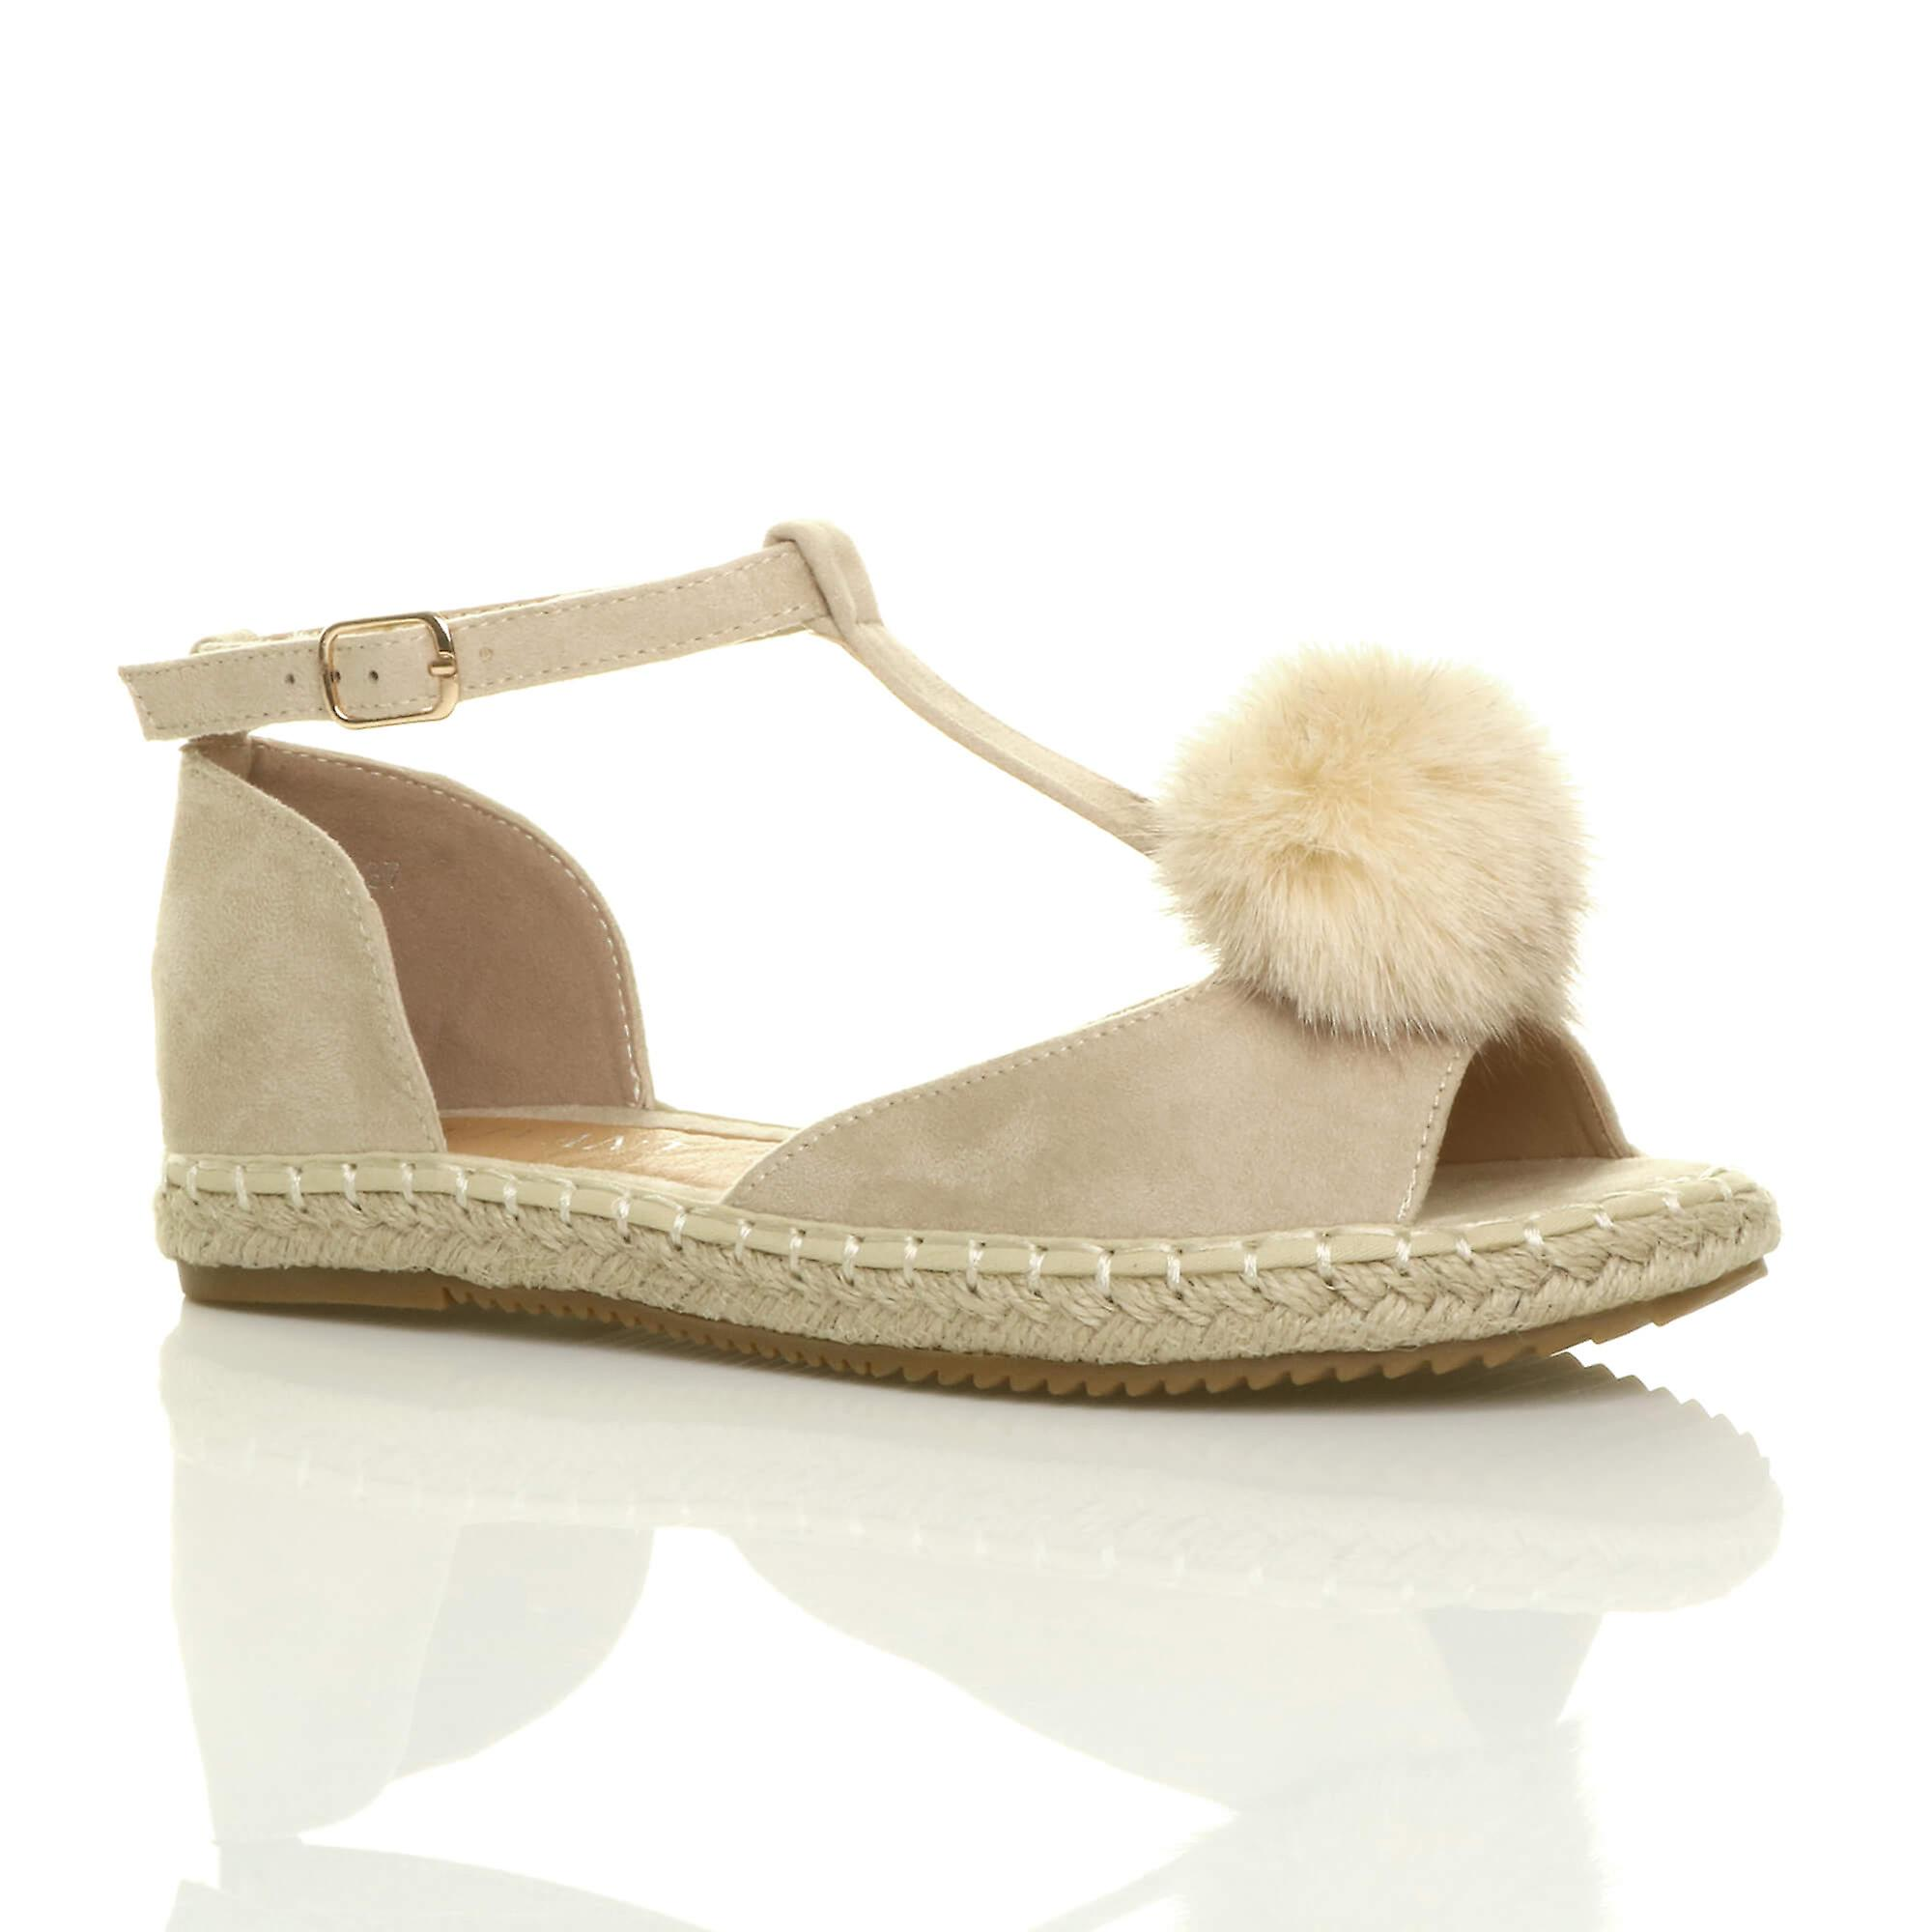 Ajvani womens flat t-bar pom pom buckle peep toe shoes espadrilles sandals